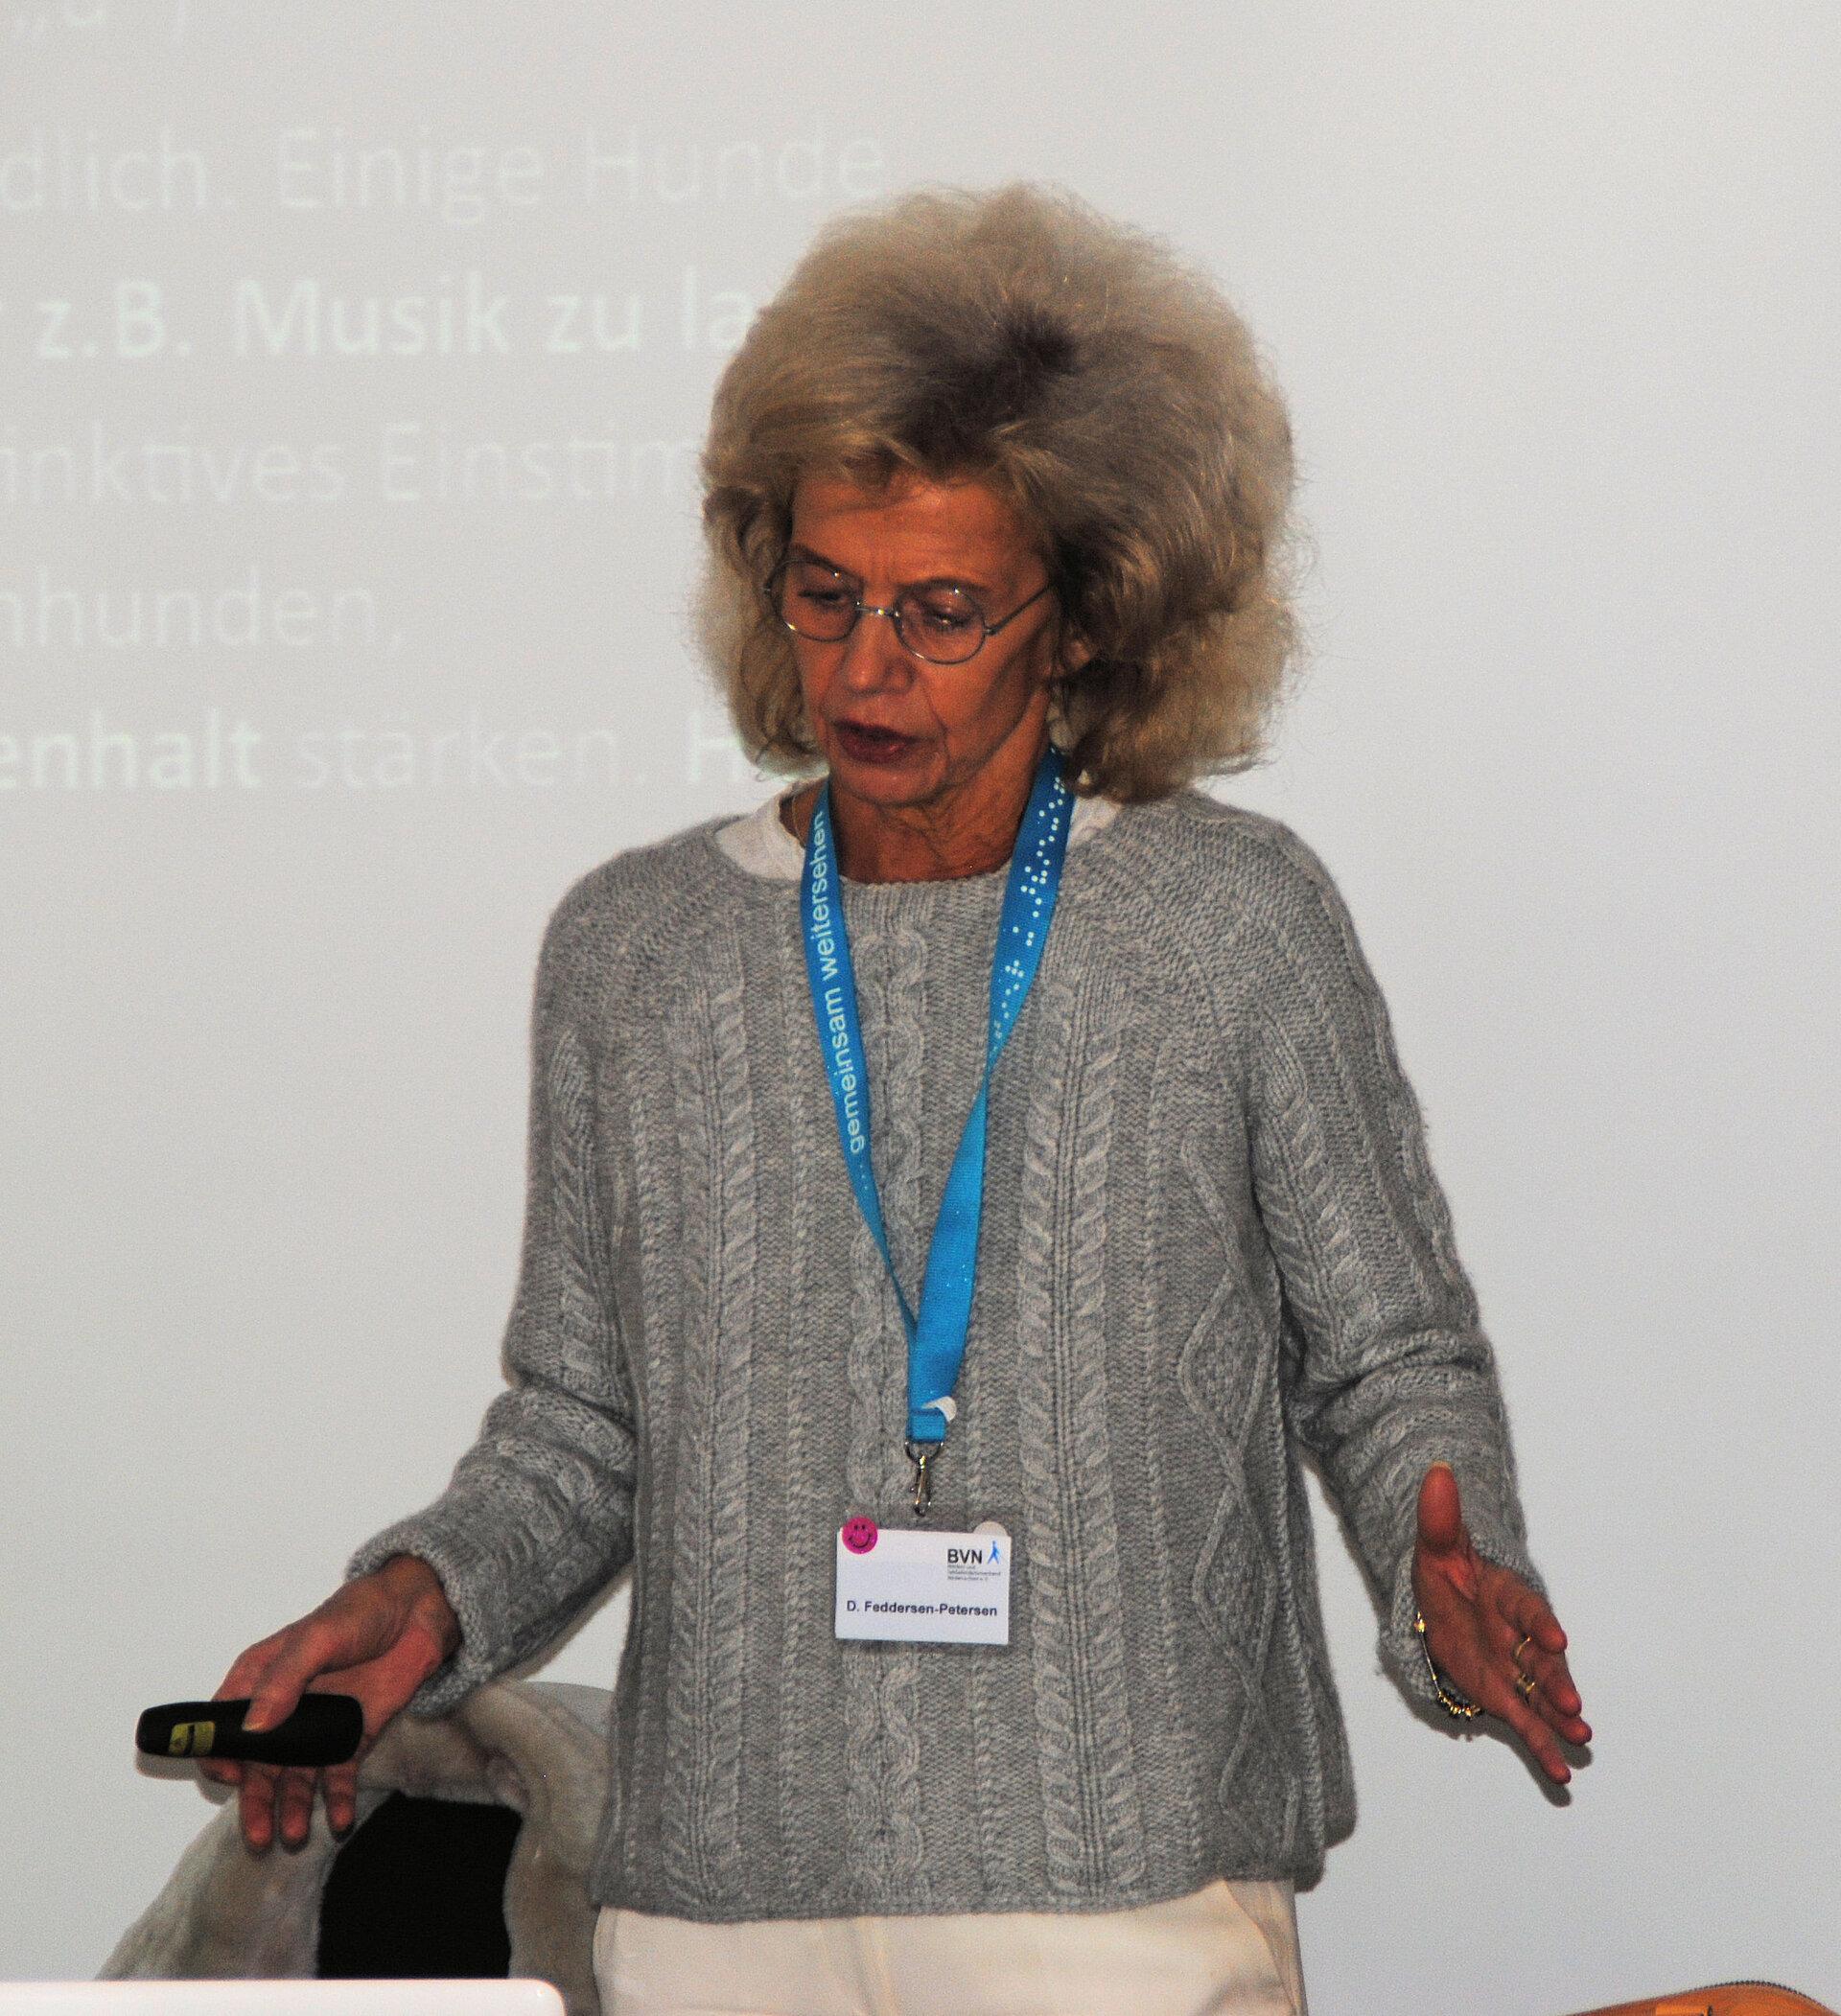 Dr. Dorit Urd Feddersen Petersen